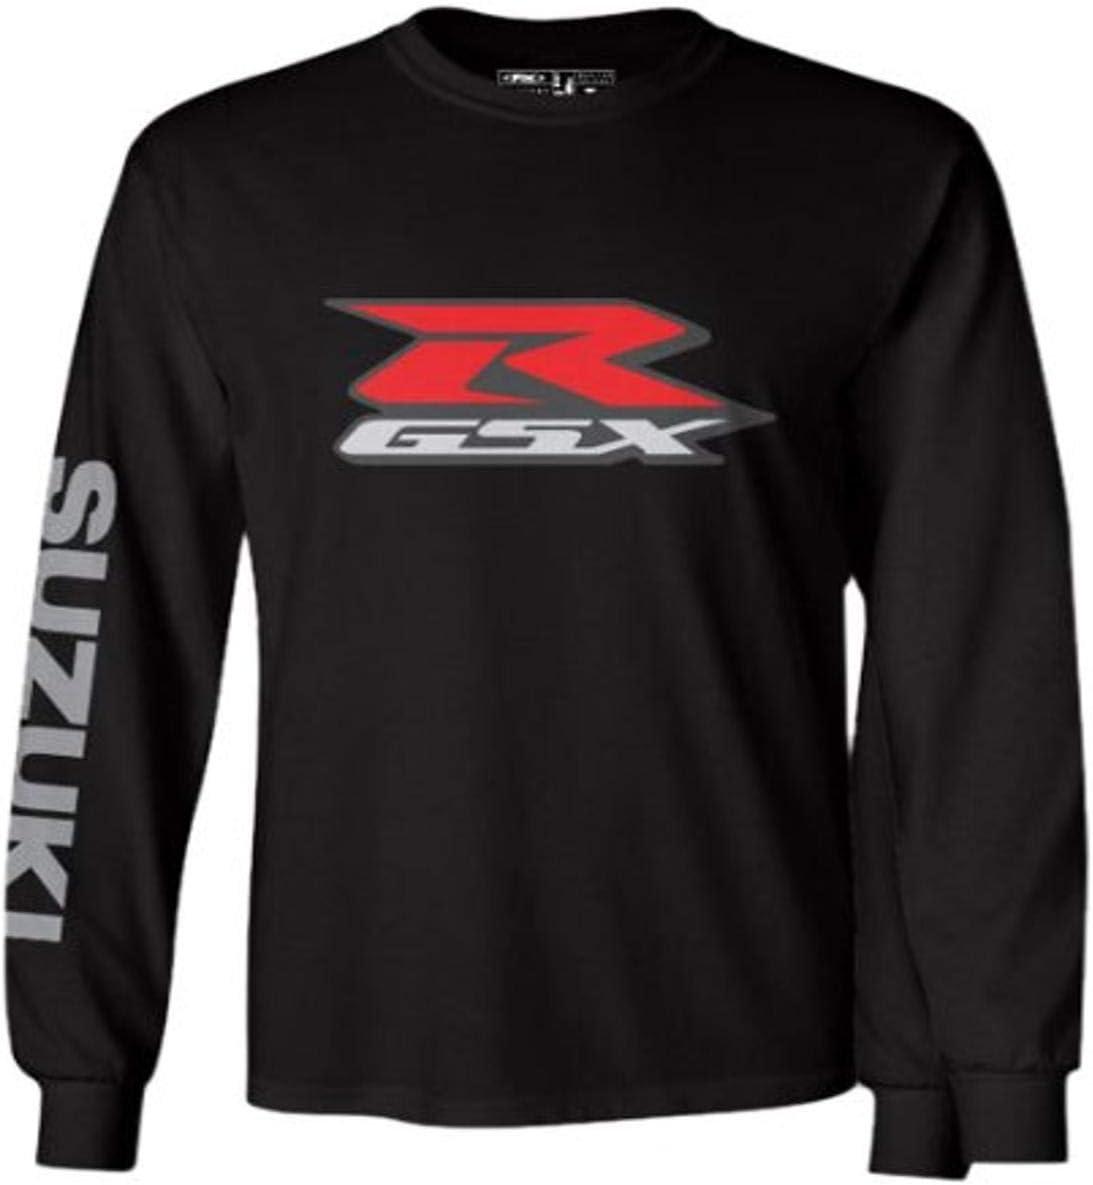 Black, X-Large Factory Effex 17-87416 SUZUKI Long Sleeve T-Shirt